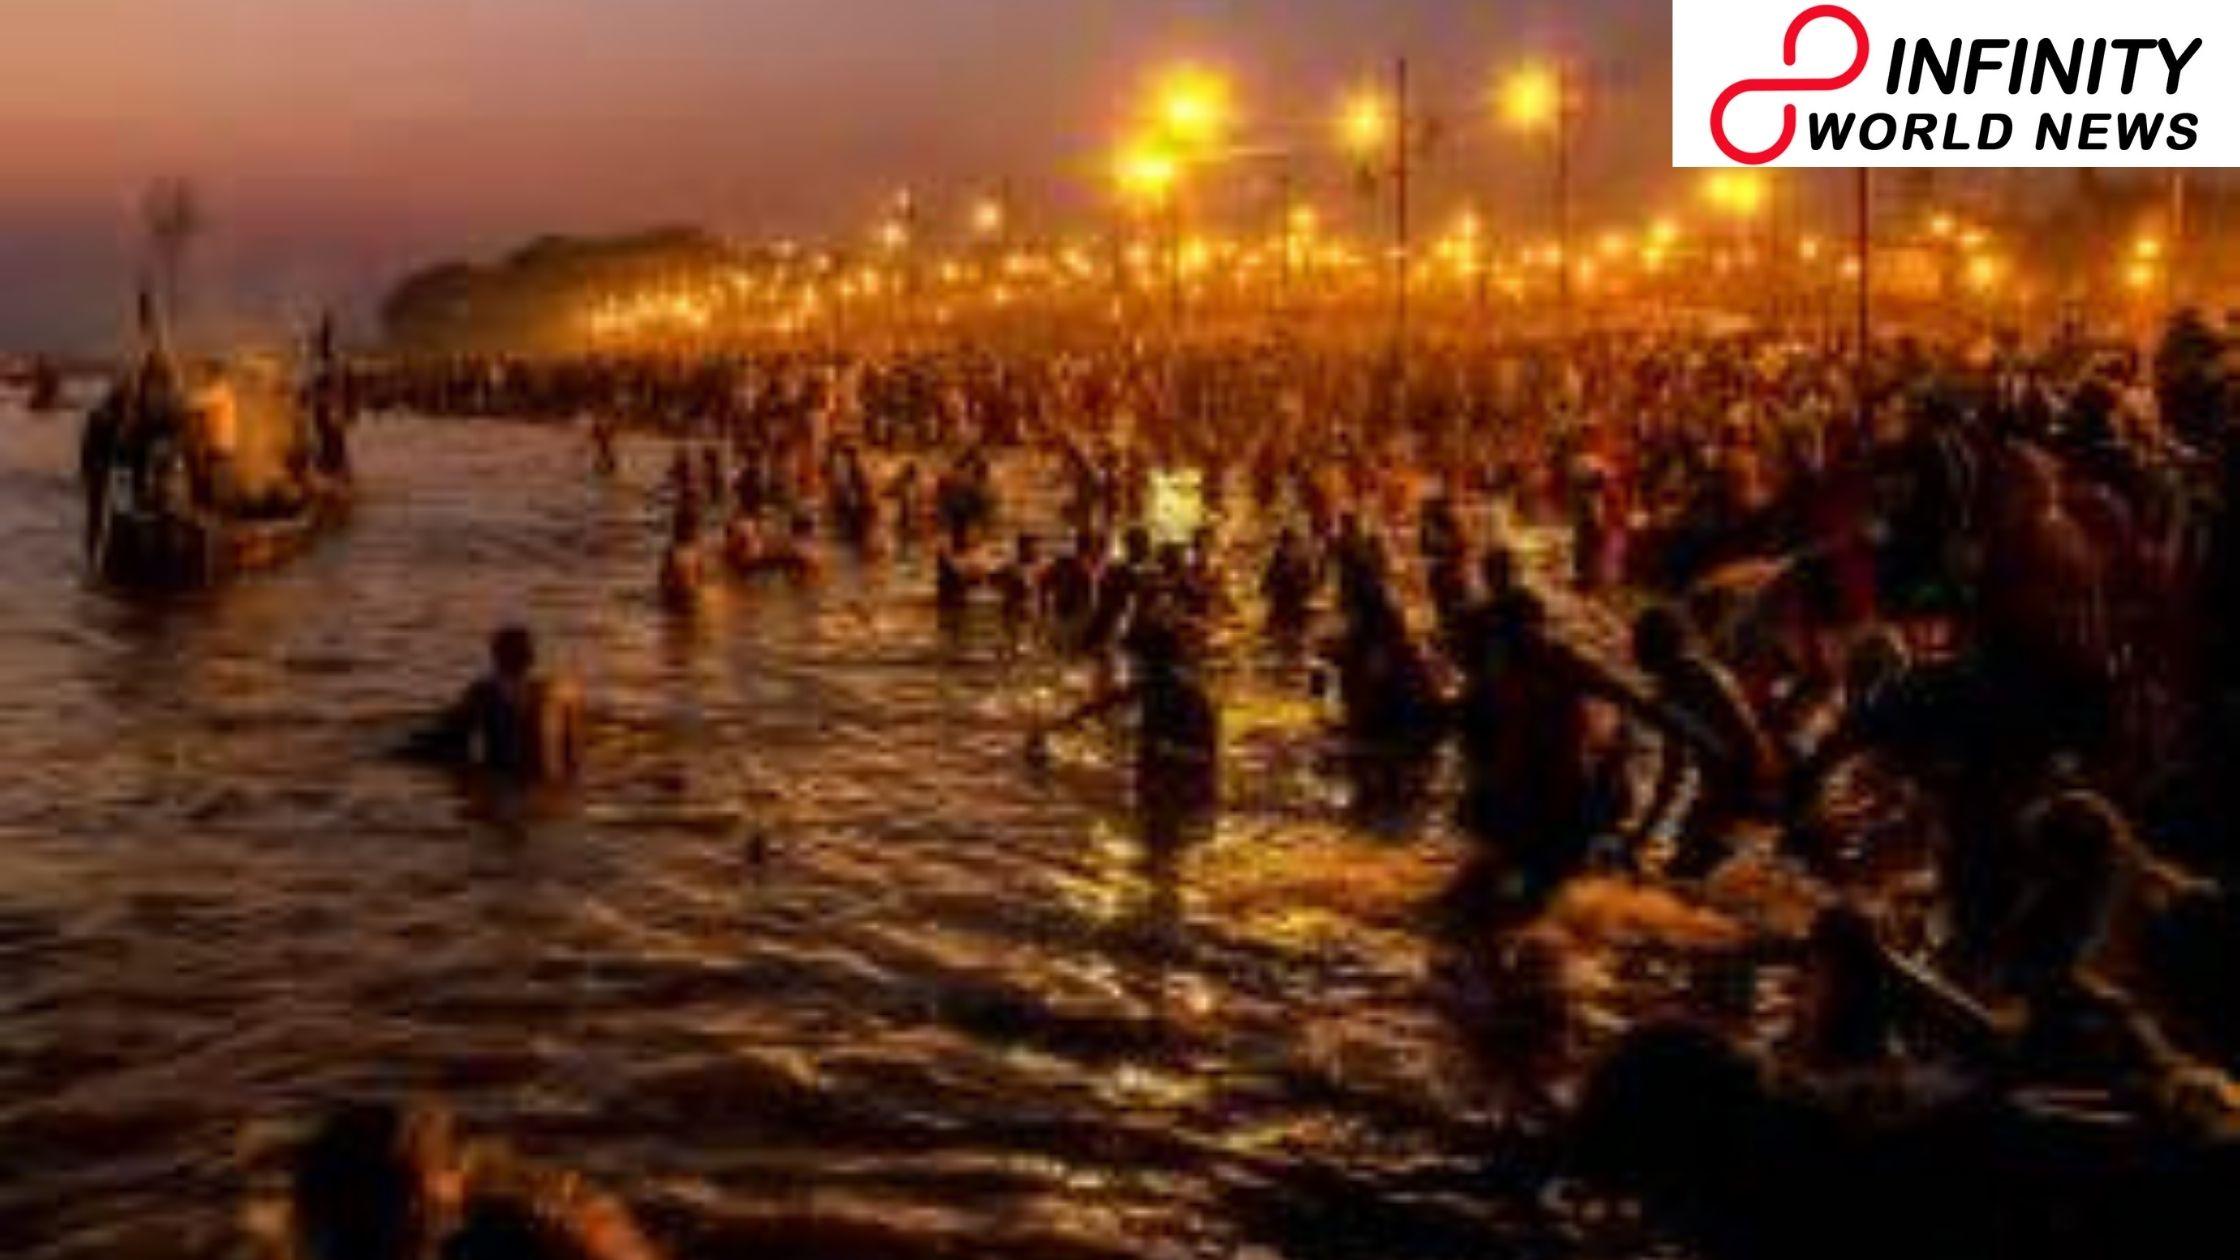 Kumbh Mela 2021 Dates & Time: All You Need to Know Concerning Ganga Snan, Shahi Snan or to bathe at Haridwar Kumbh